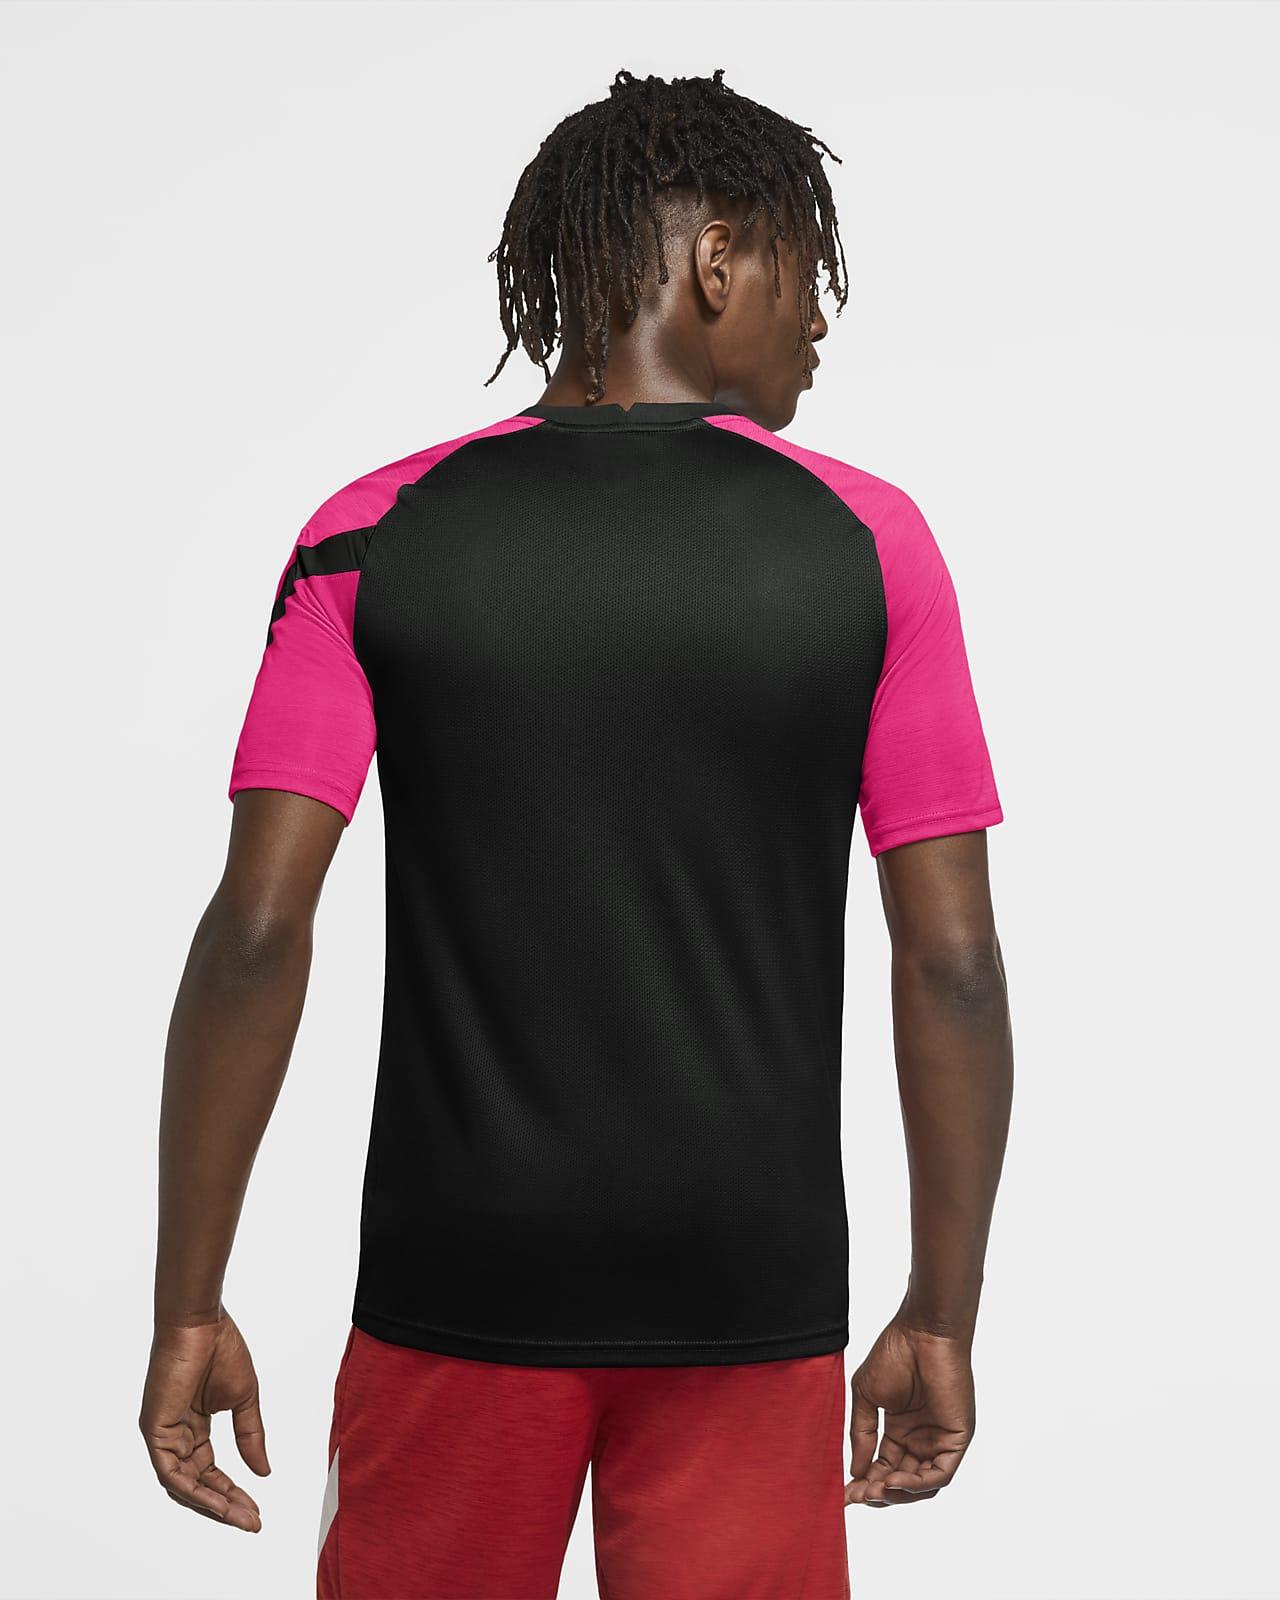 Camiseta de fútbol de manga corta con gráfico para hombre Nike Dri-FIT  Academy